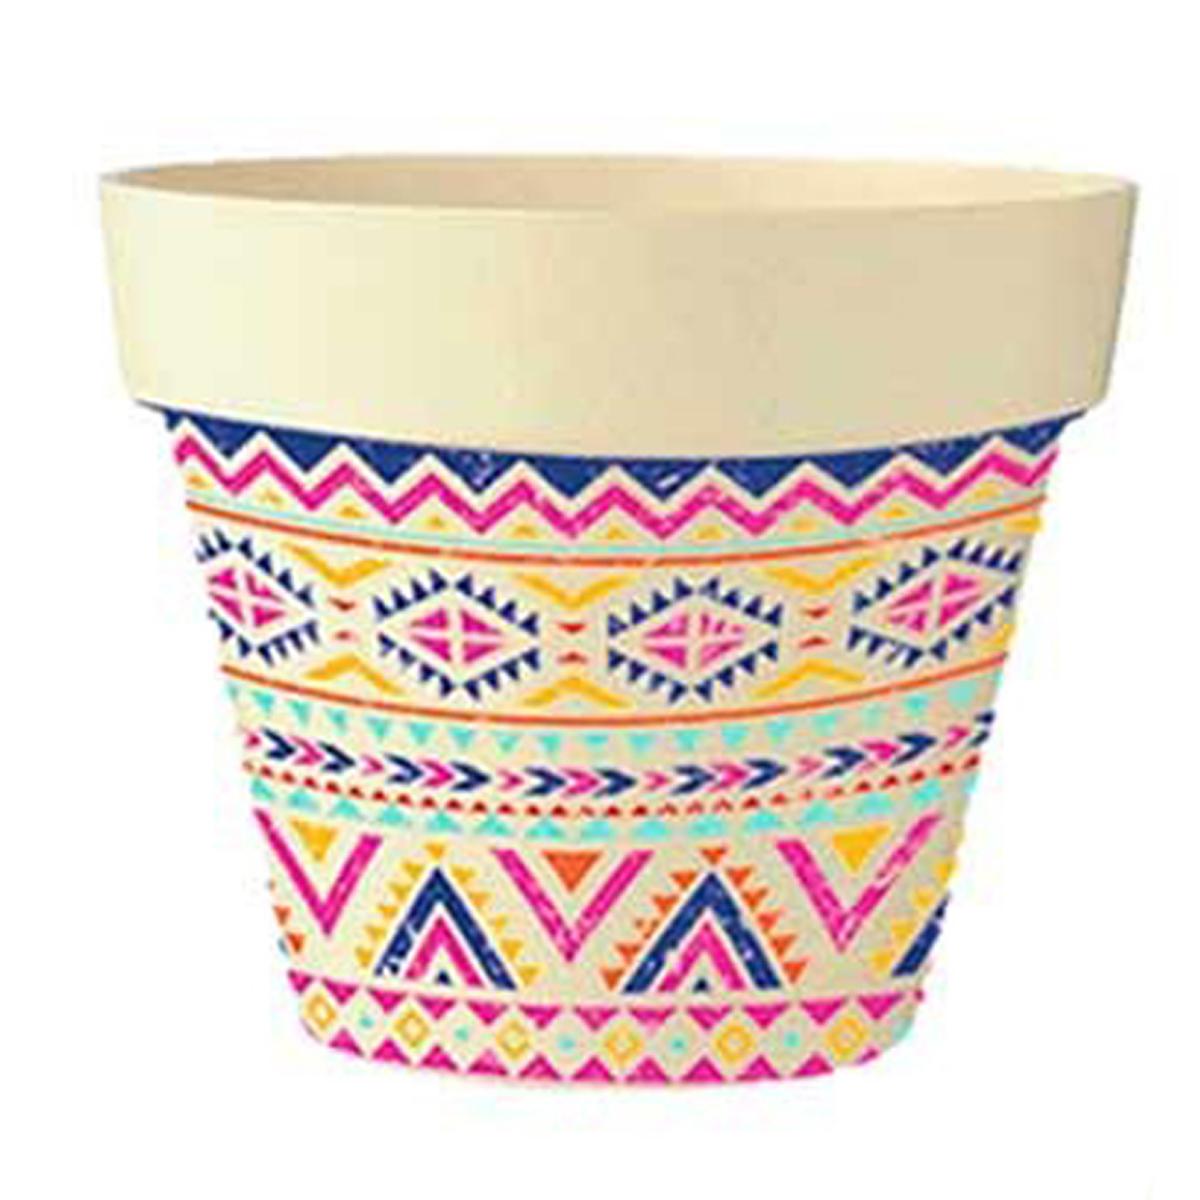 Cache-pot bambou \'Boho\' rose multicolore -  105x95 cm - [Q6417]